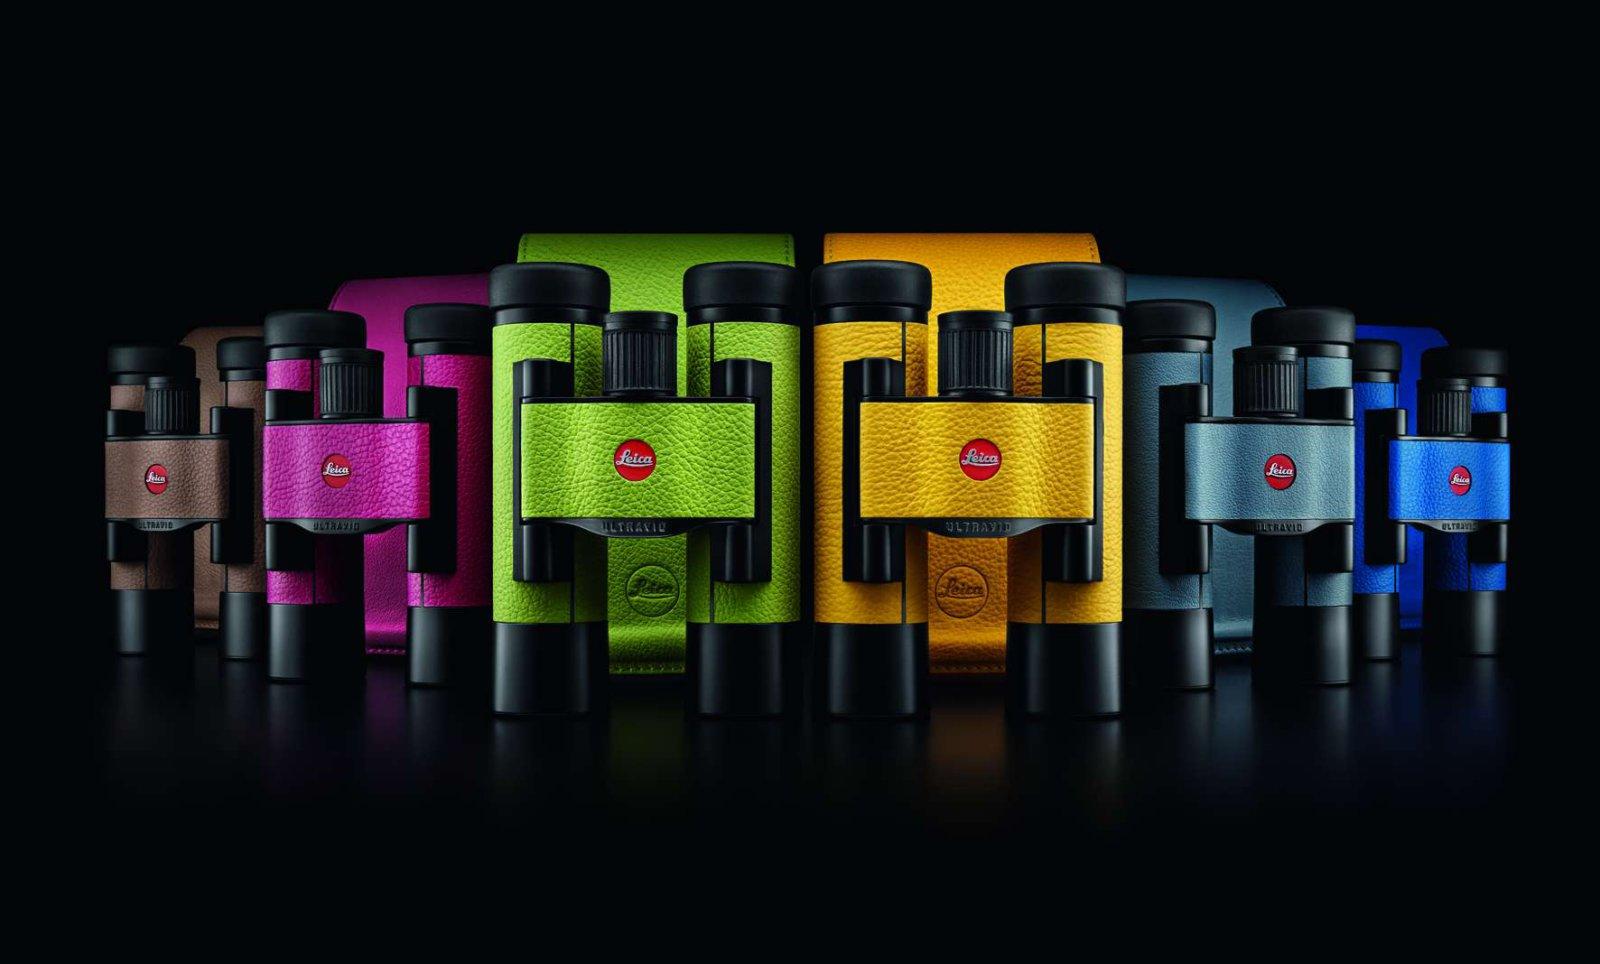 Leica FG Ultravid Colorline